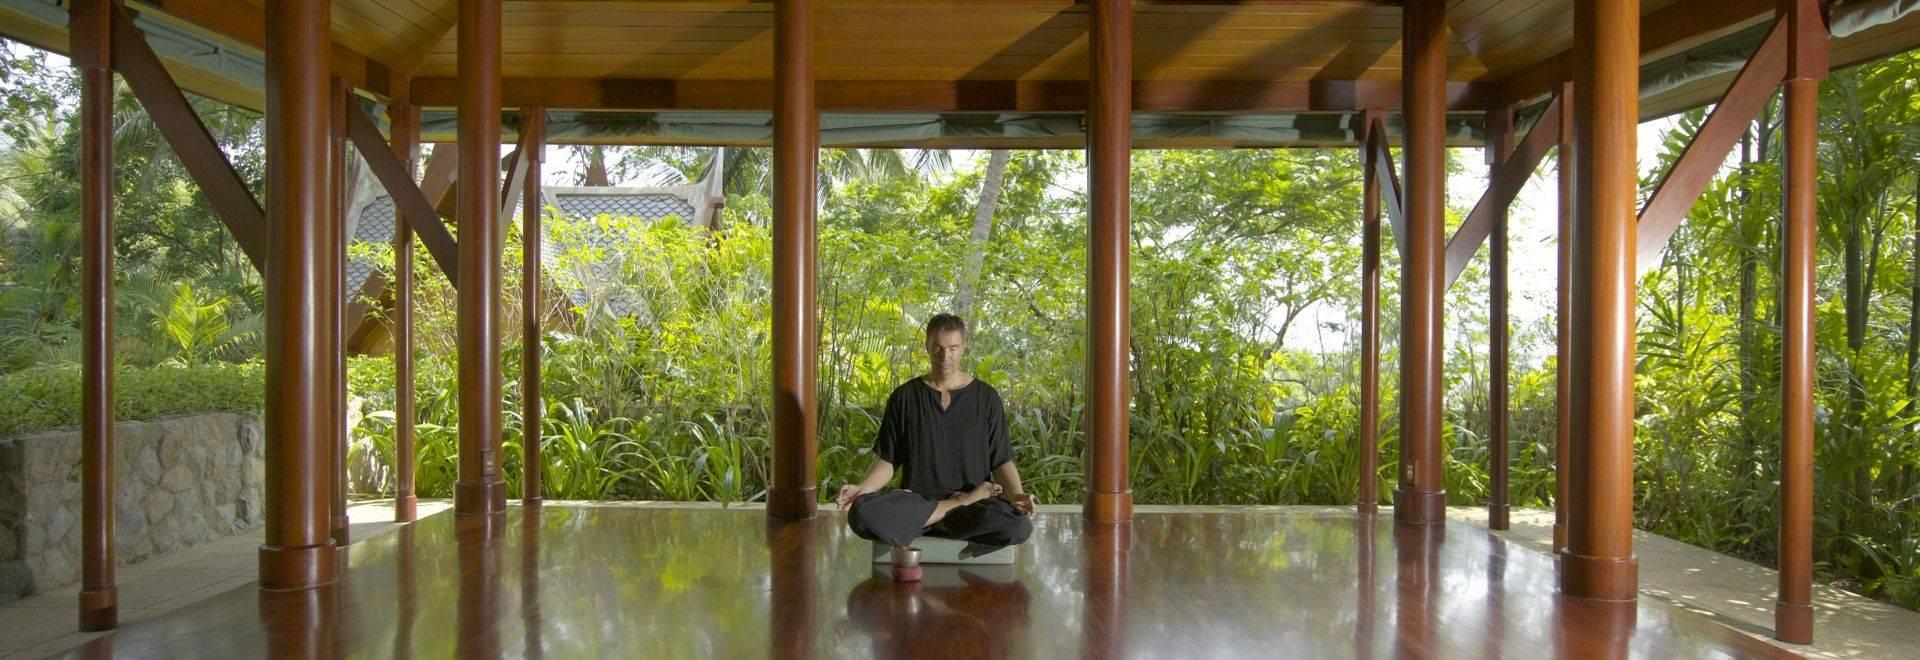 Amanpuri-meditation-sala.jpg